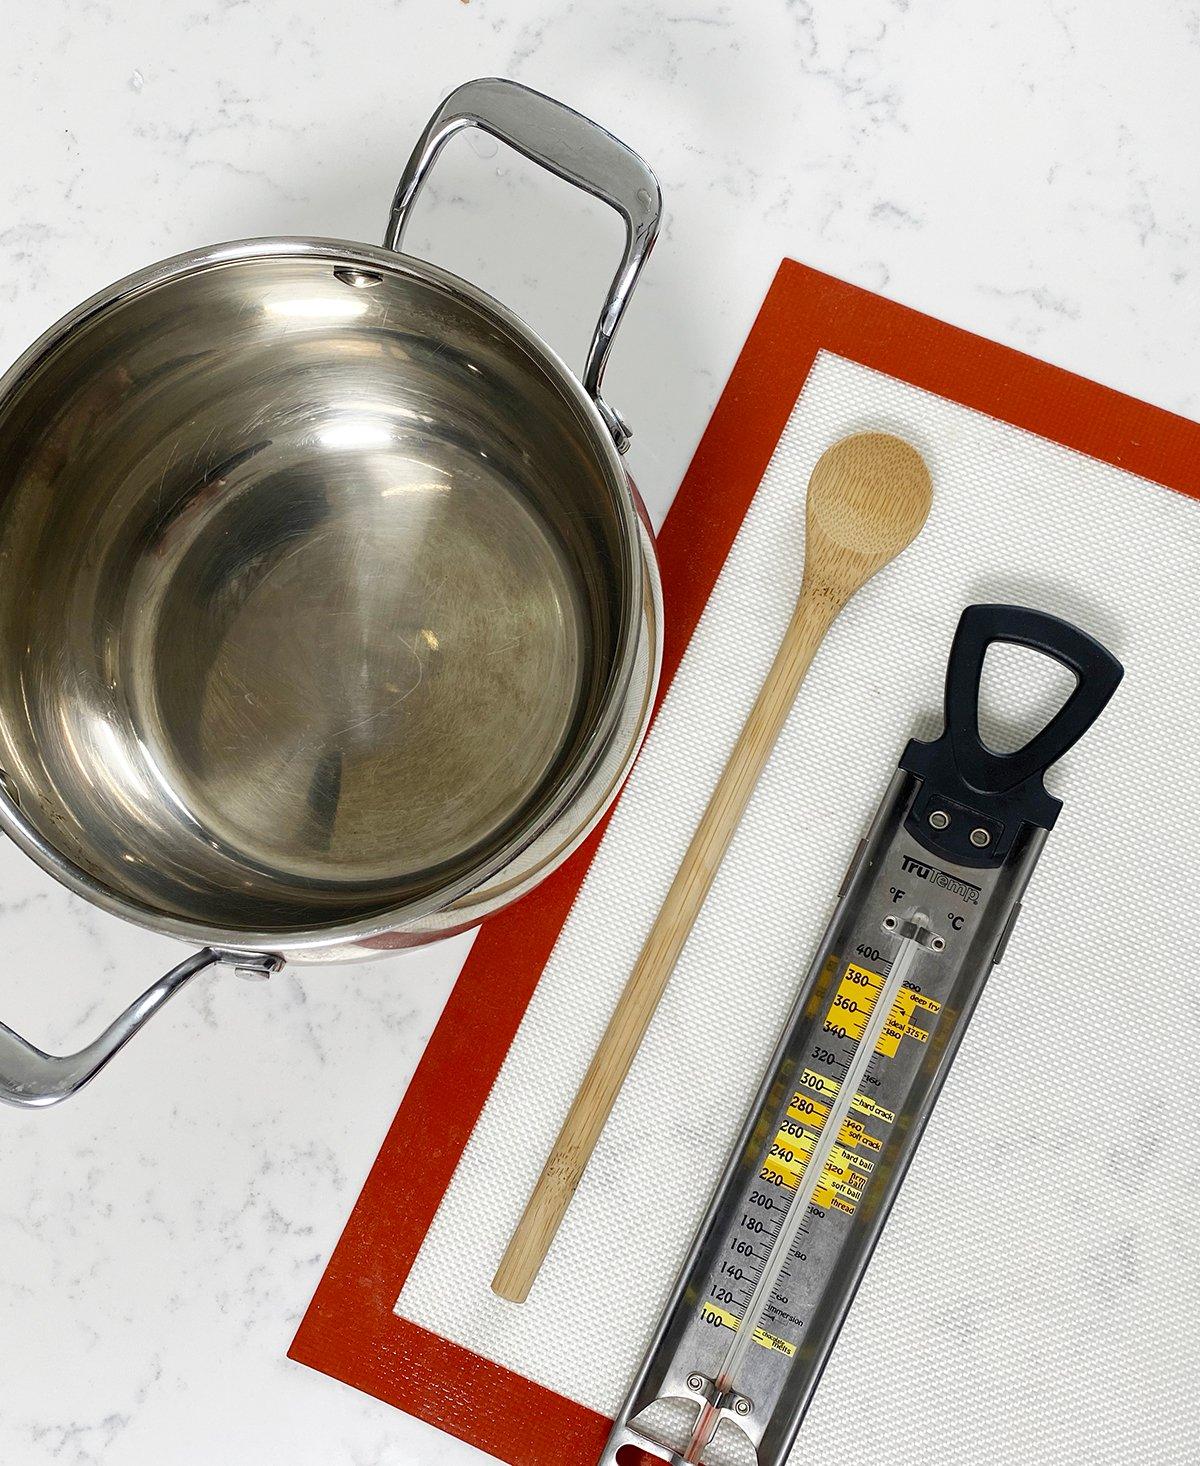 caramel apple tools